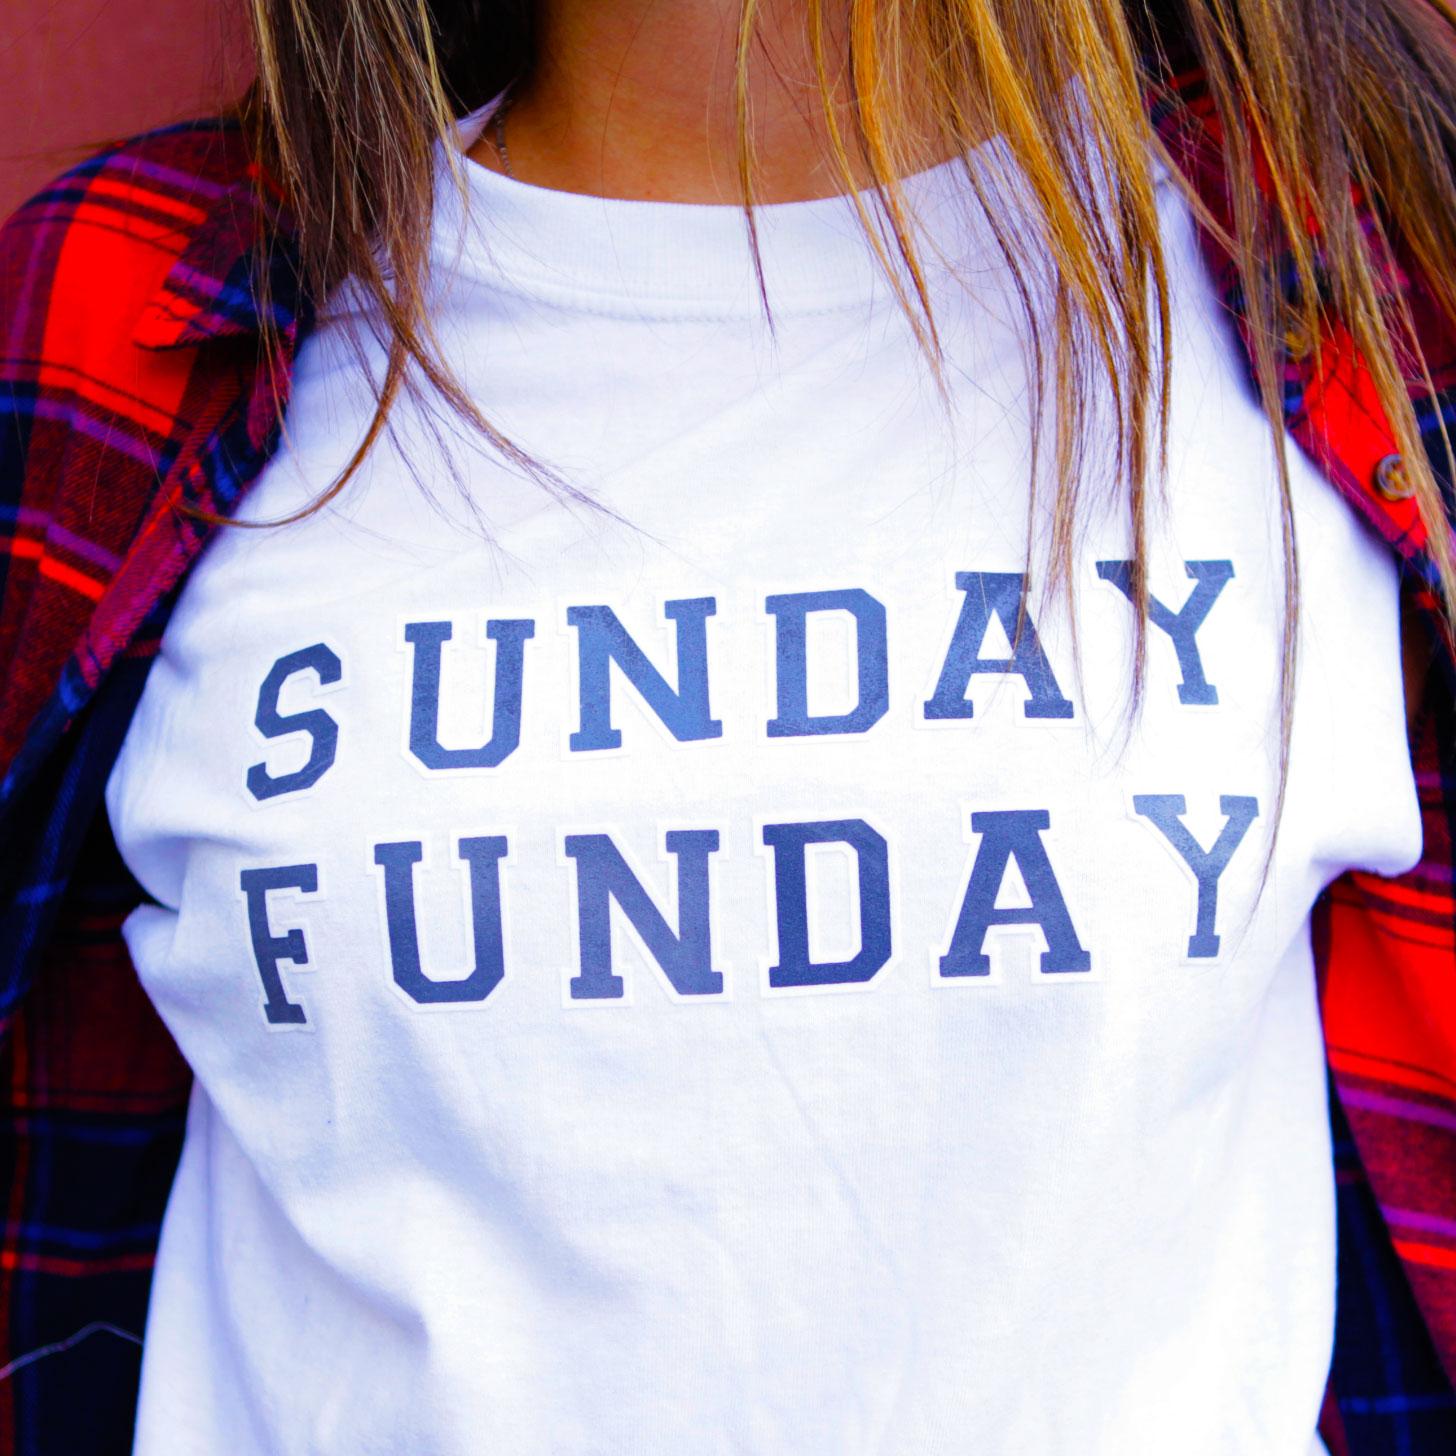 T shirt slogans dating